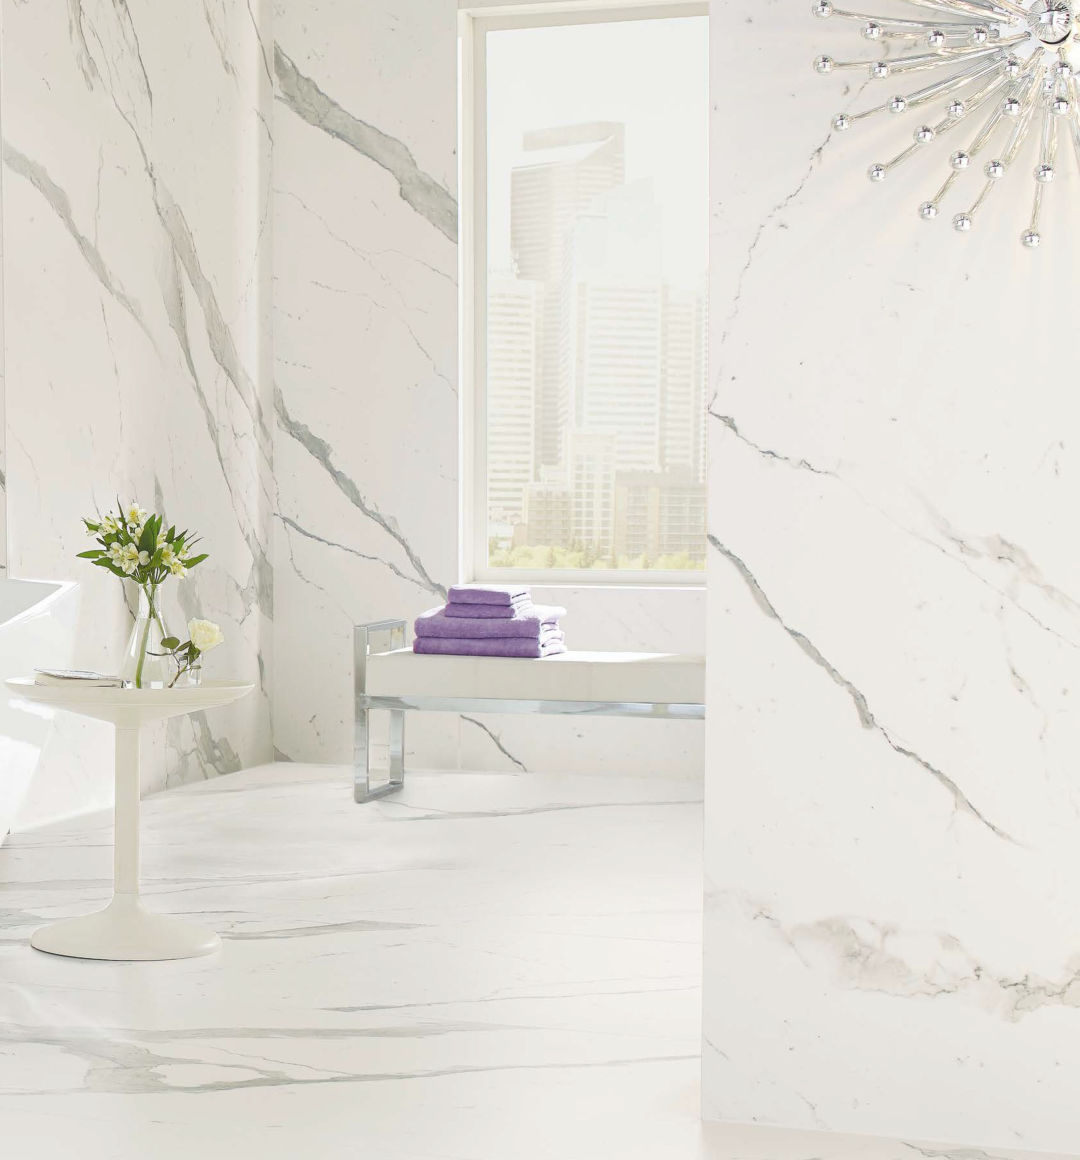 Jessica napoli porcelain tile panels httqd8